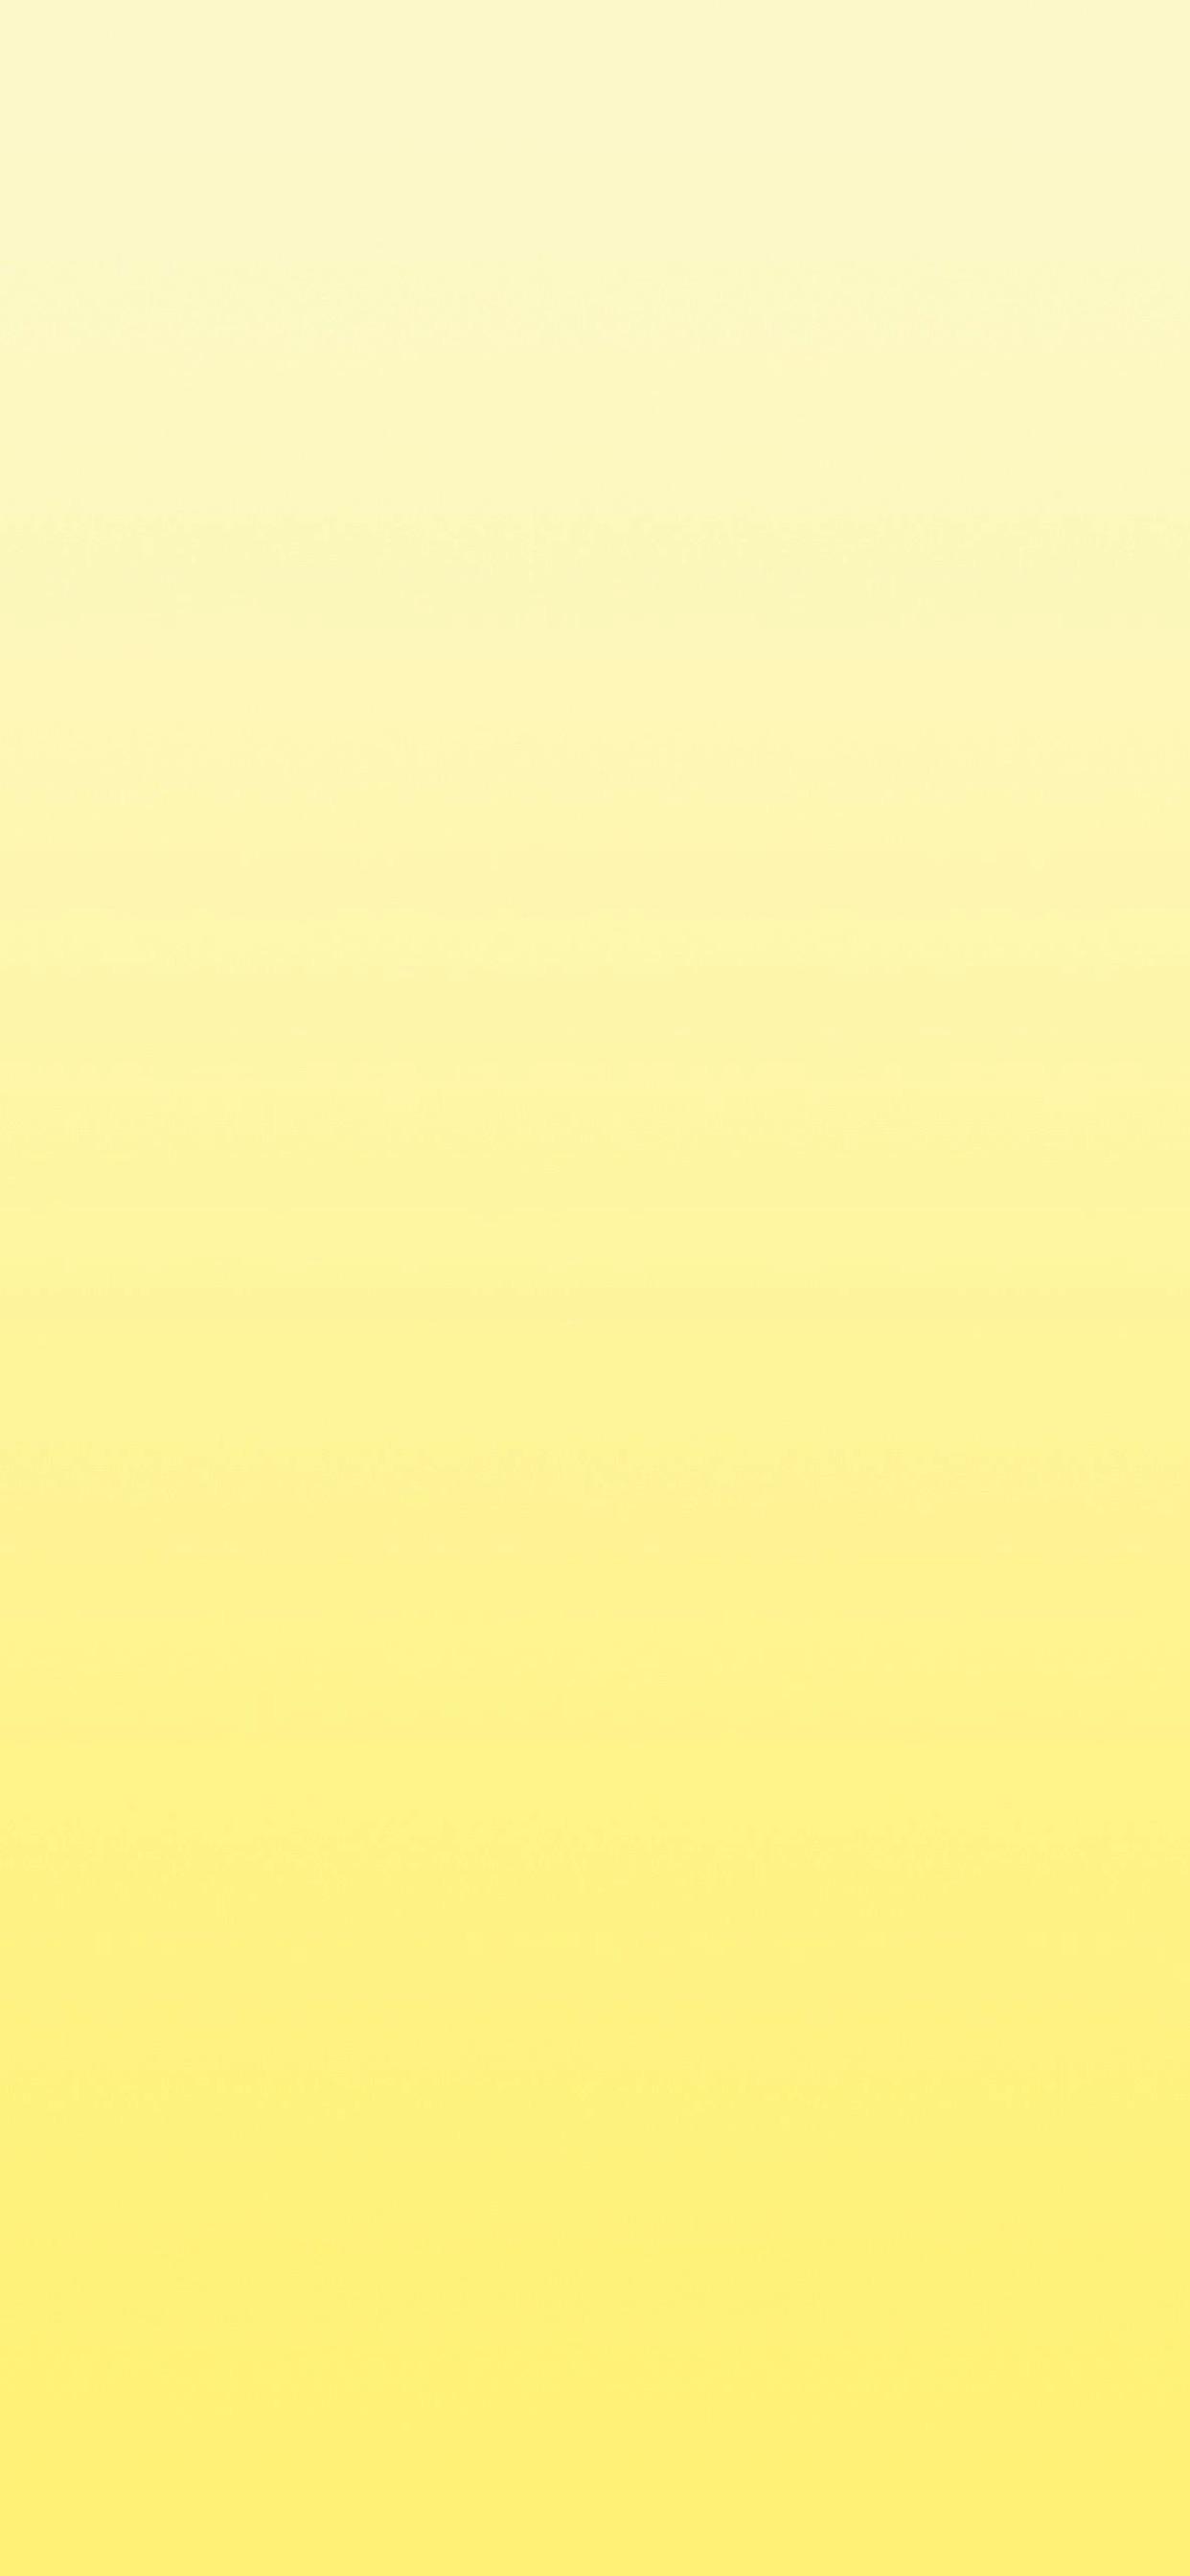 iPhone XS Max 壁紙 0134